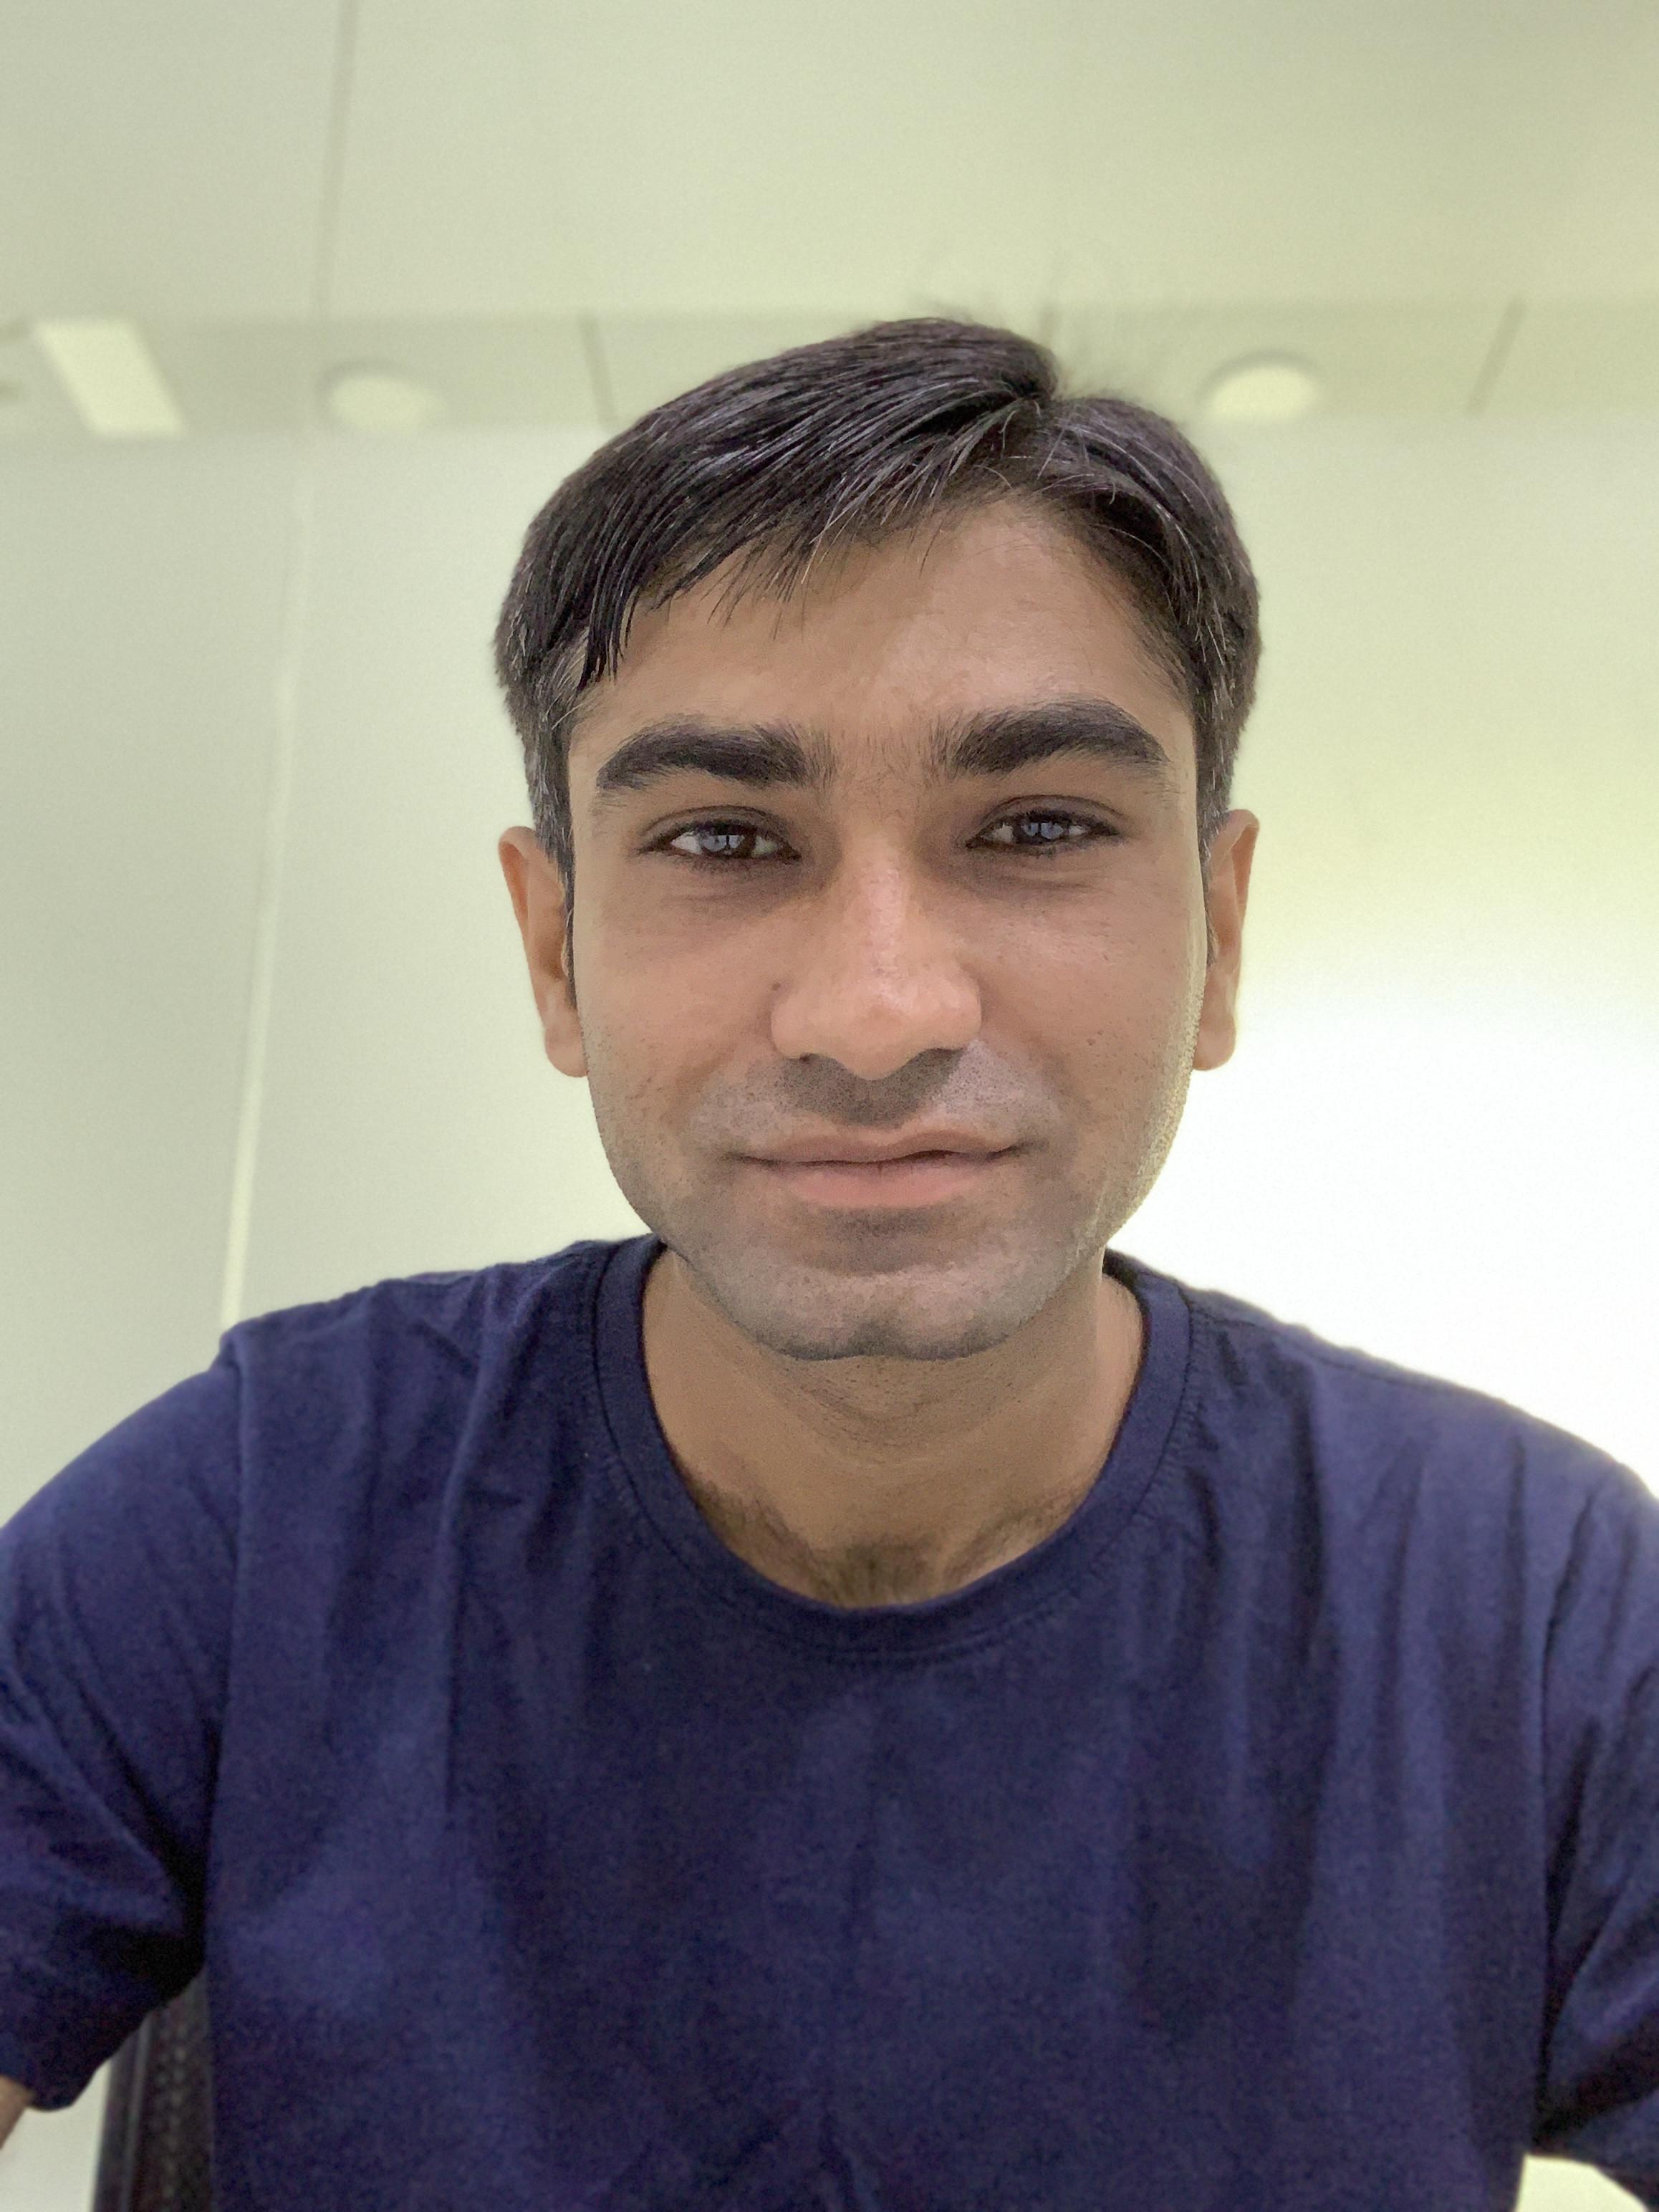 Bony A Patel